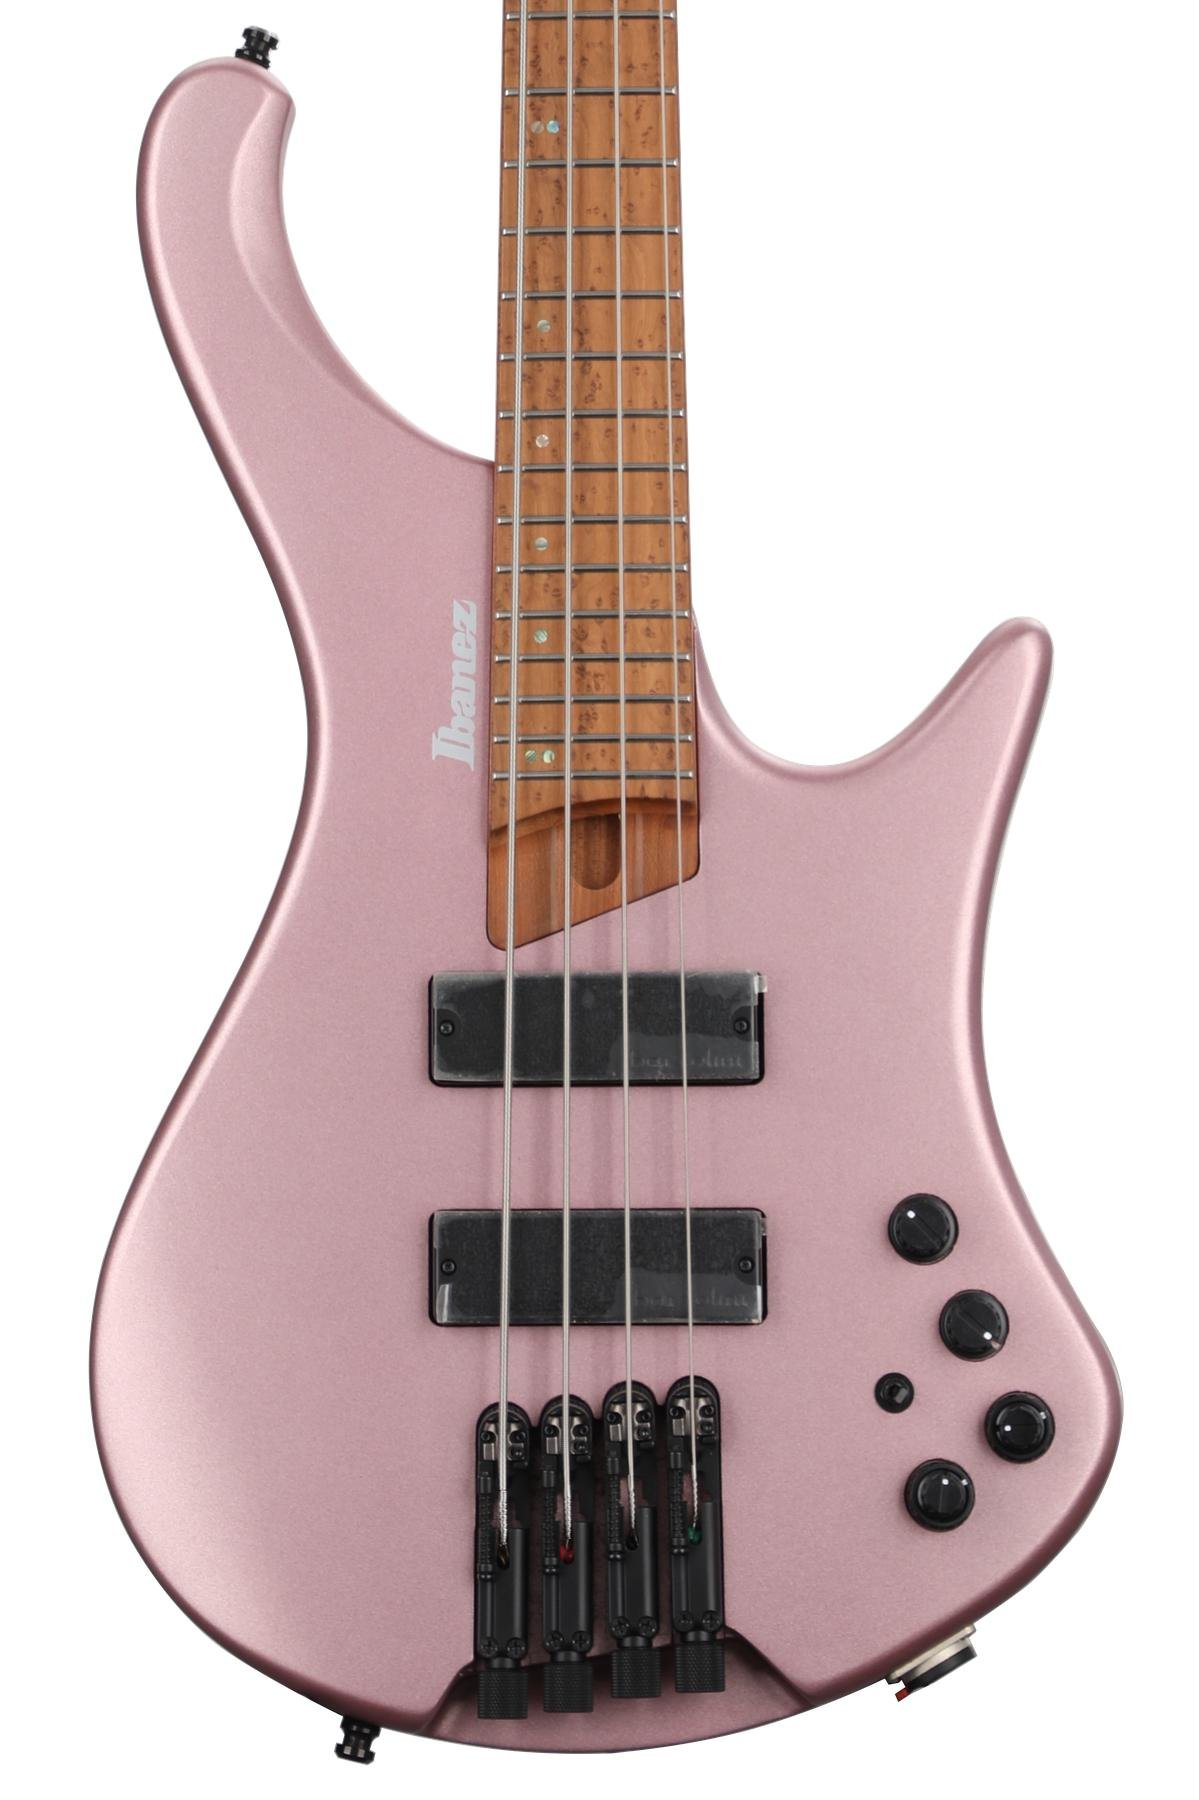 Ibanez Bass Workshop Ehb1000s Bass Guitar Pink Gold Metallic Matte Sweetwater